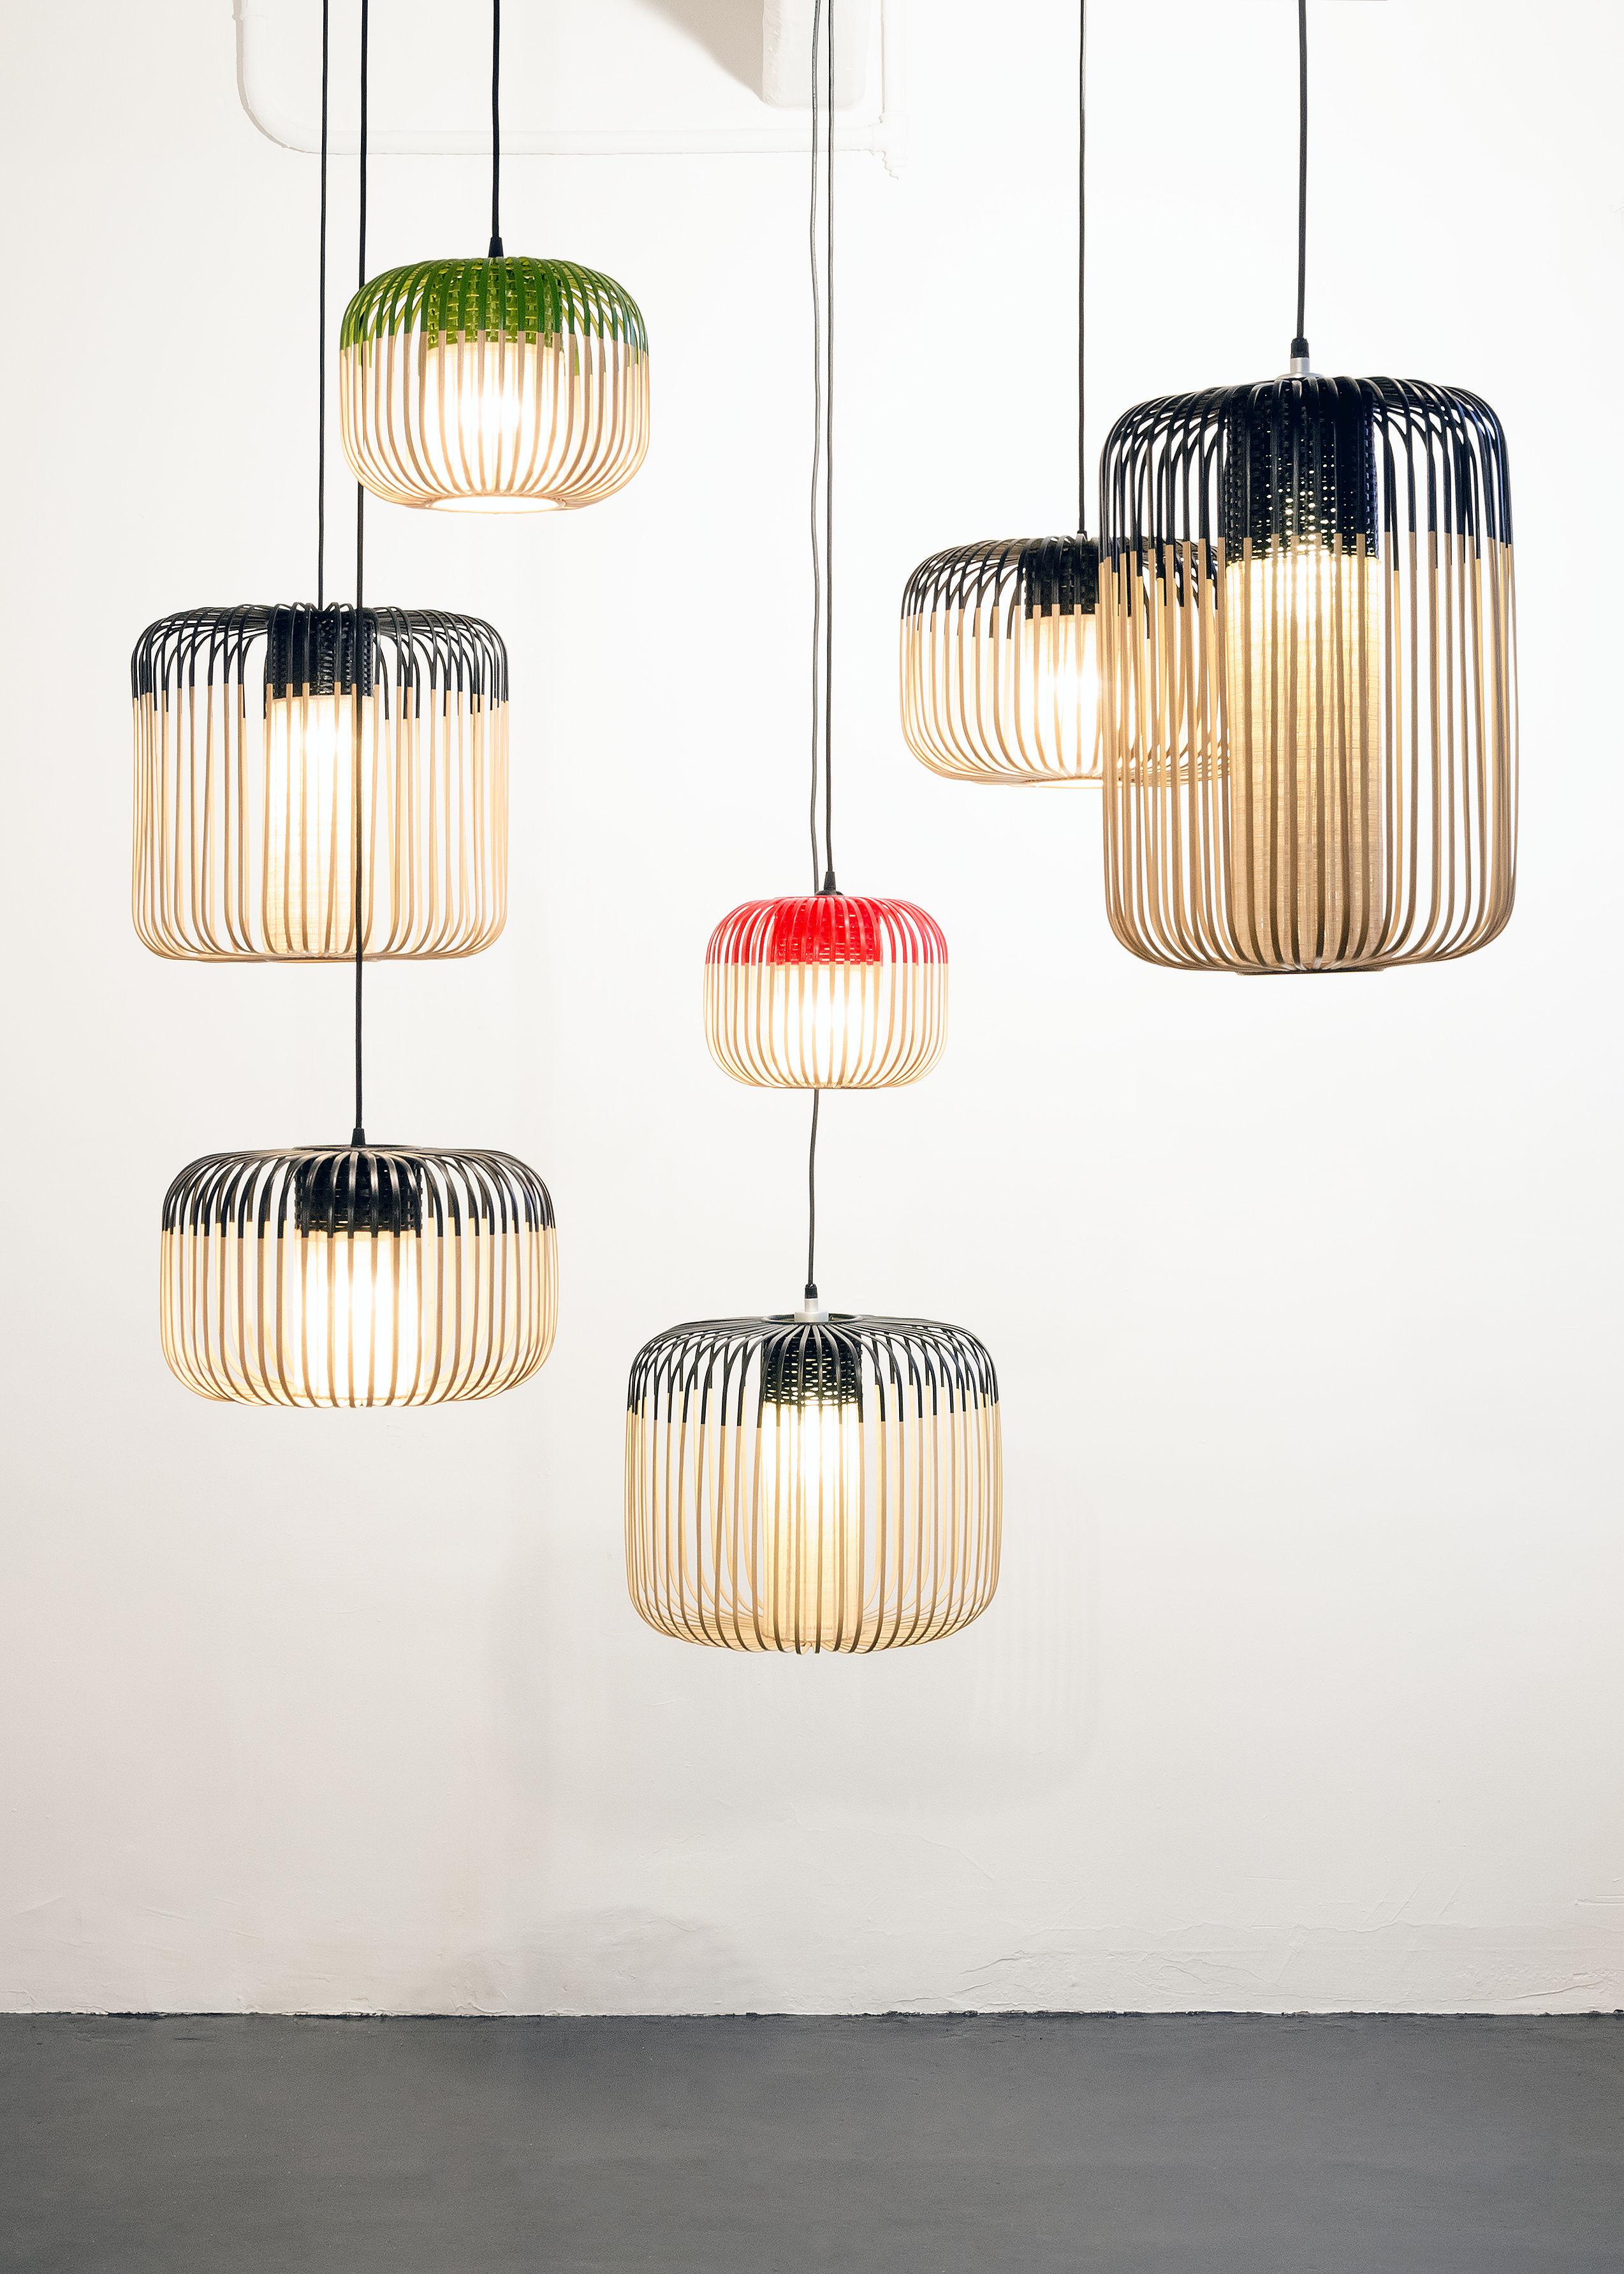 suspension bamboo light s h 23 x 35 cm vert naturel forestier. Black Bedroom Furniture Sets. Home Design Ideas